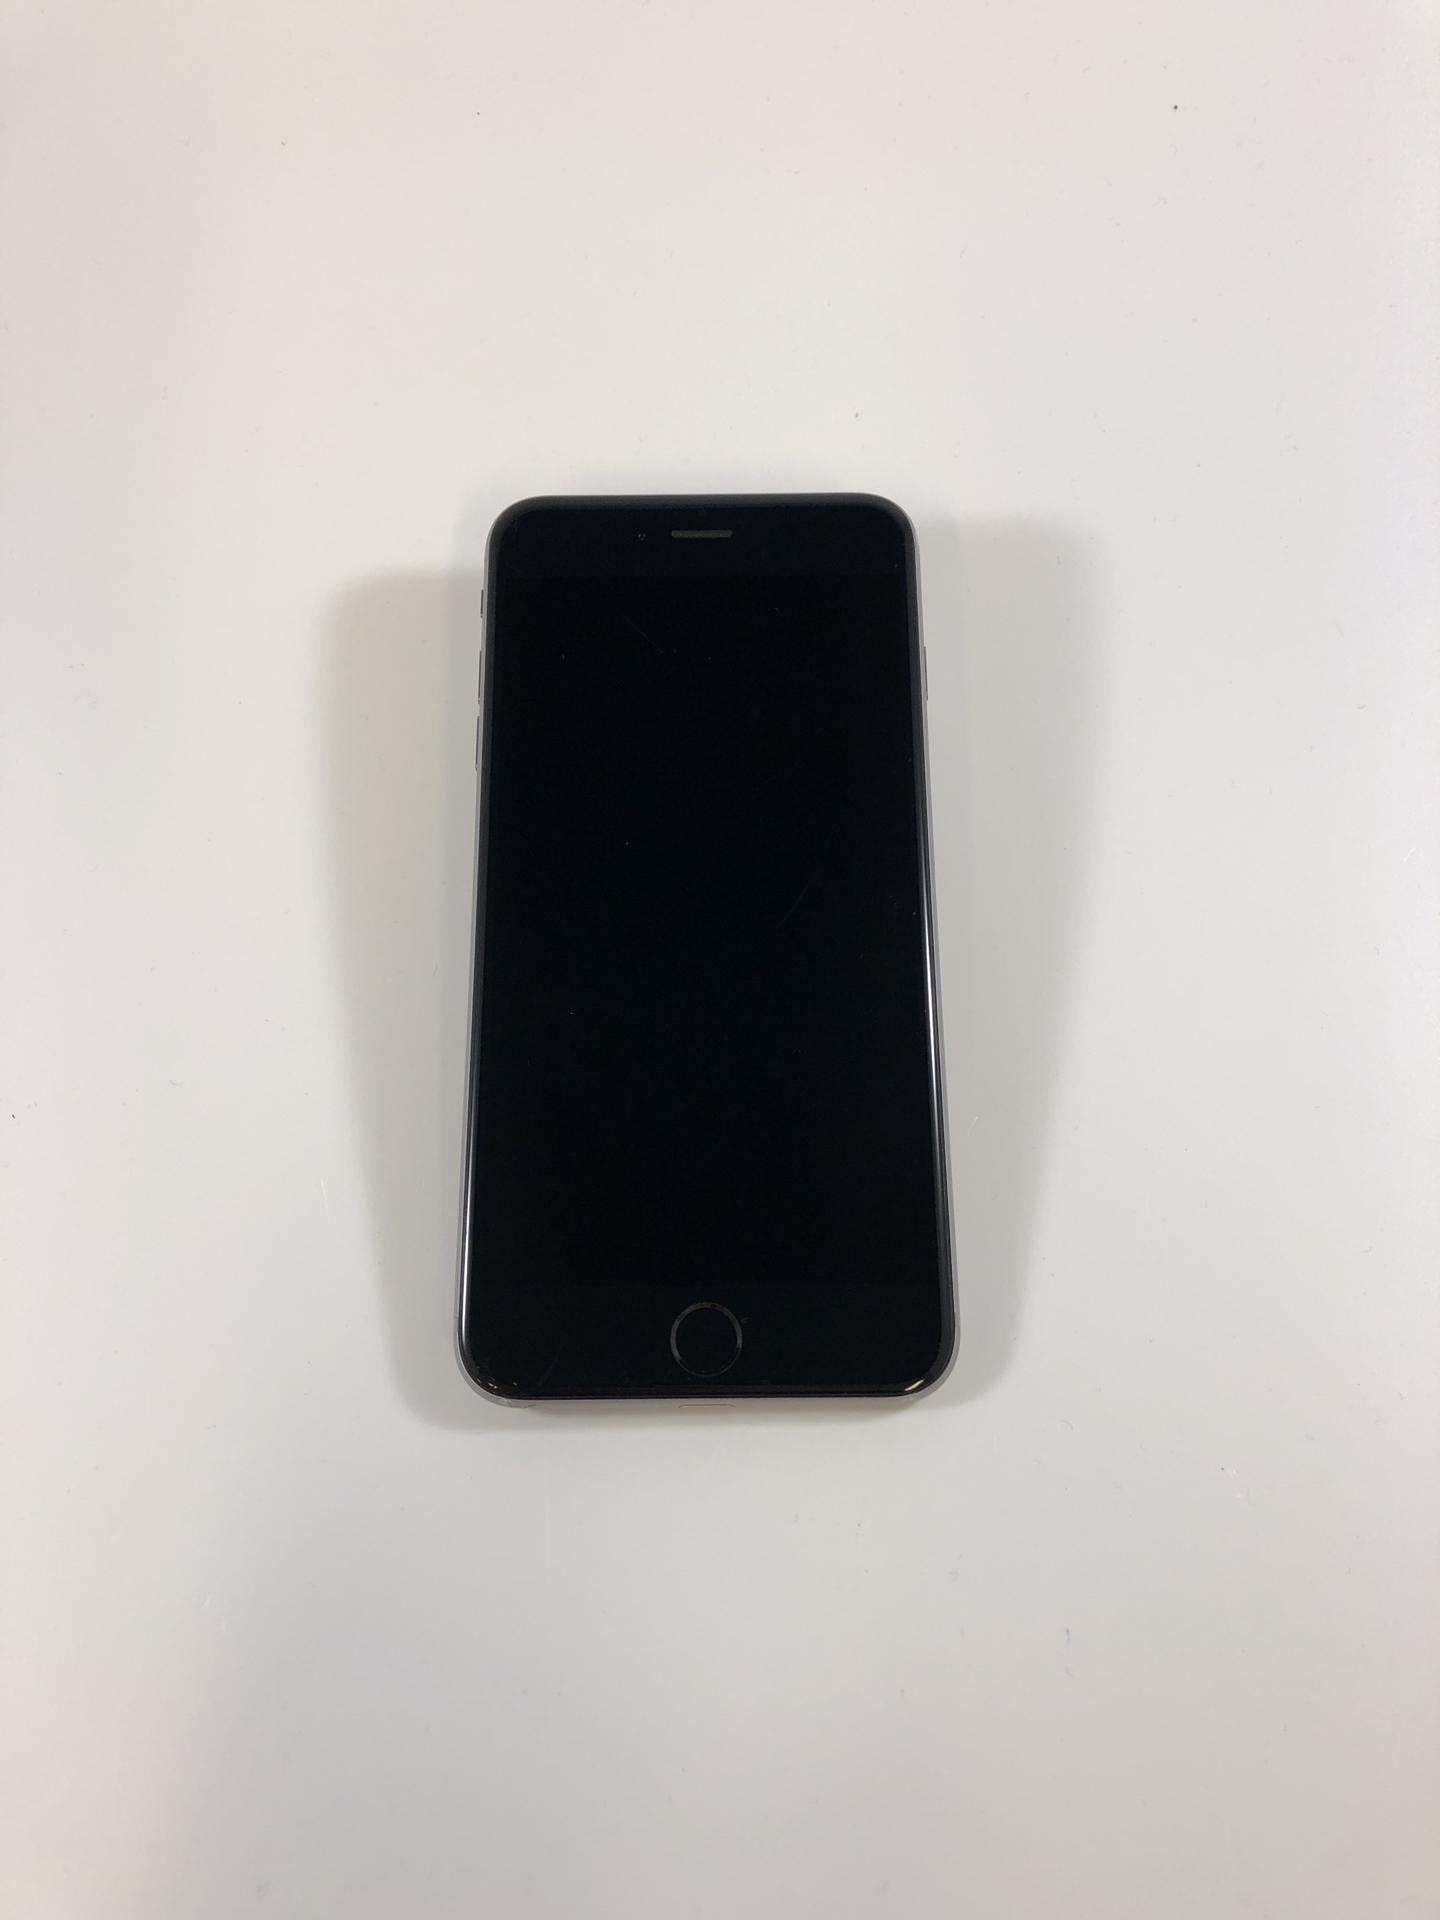 iPhone 6 Plus 64GB, 64GB, Space Gray, Kuva 1